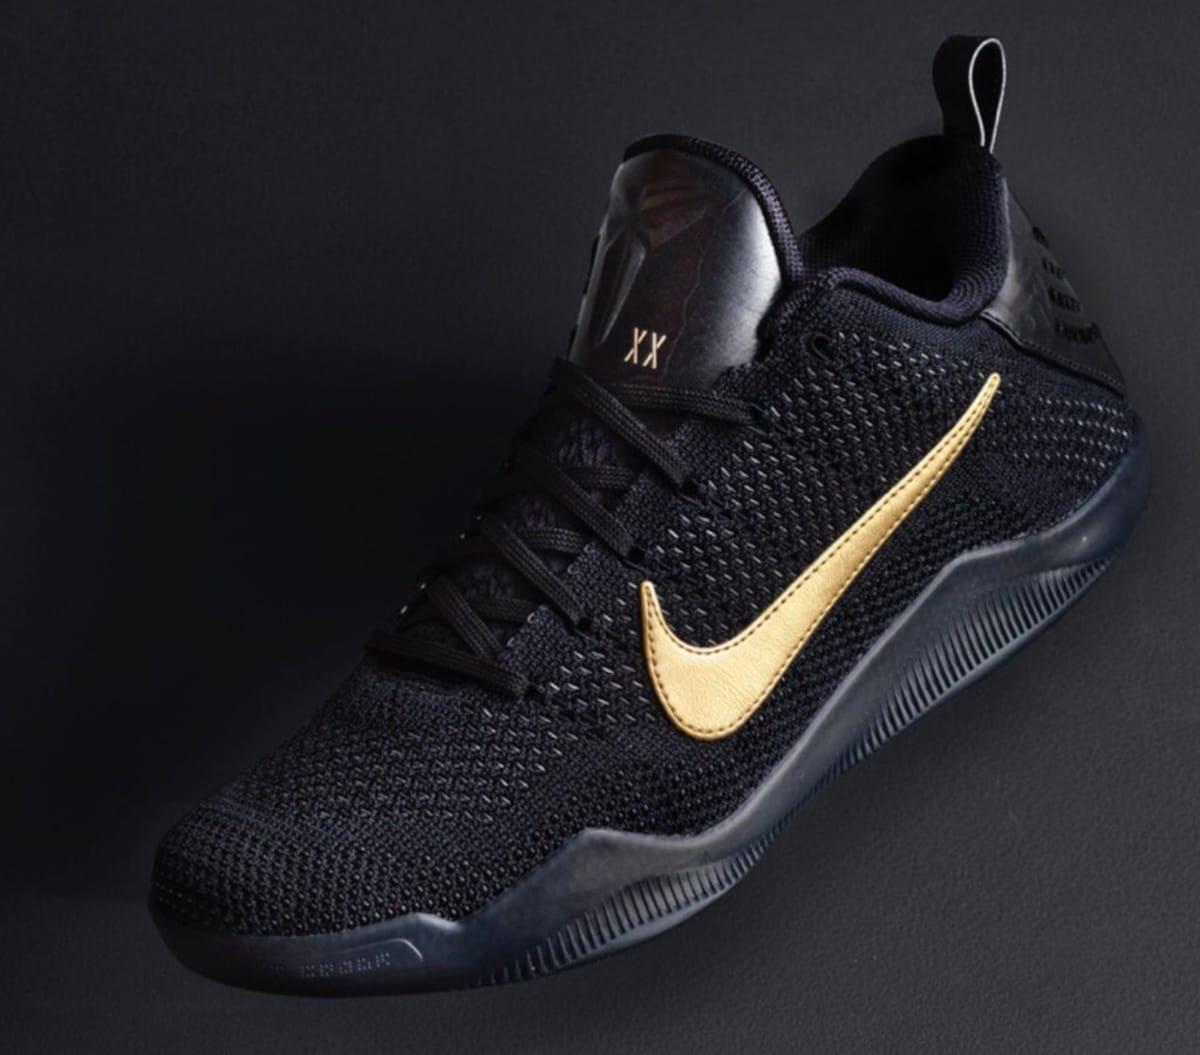 Nike Kobe Bryant Last Game Sneakers | Sole Collector